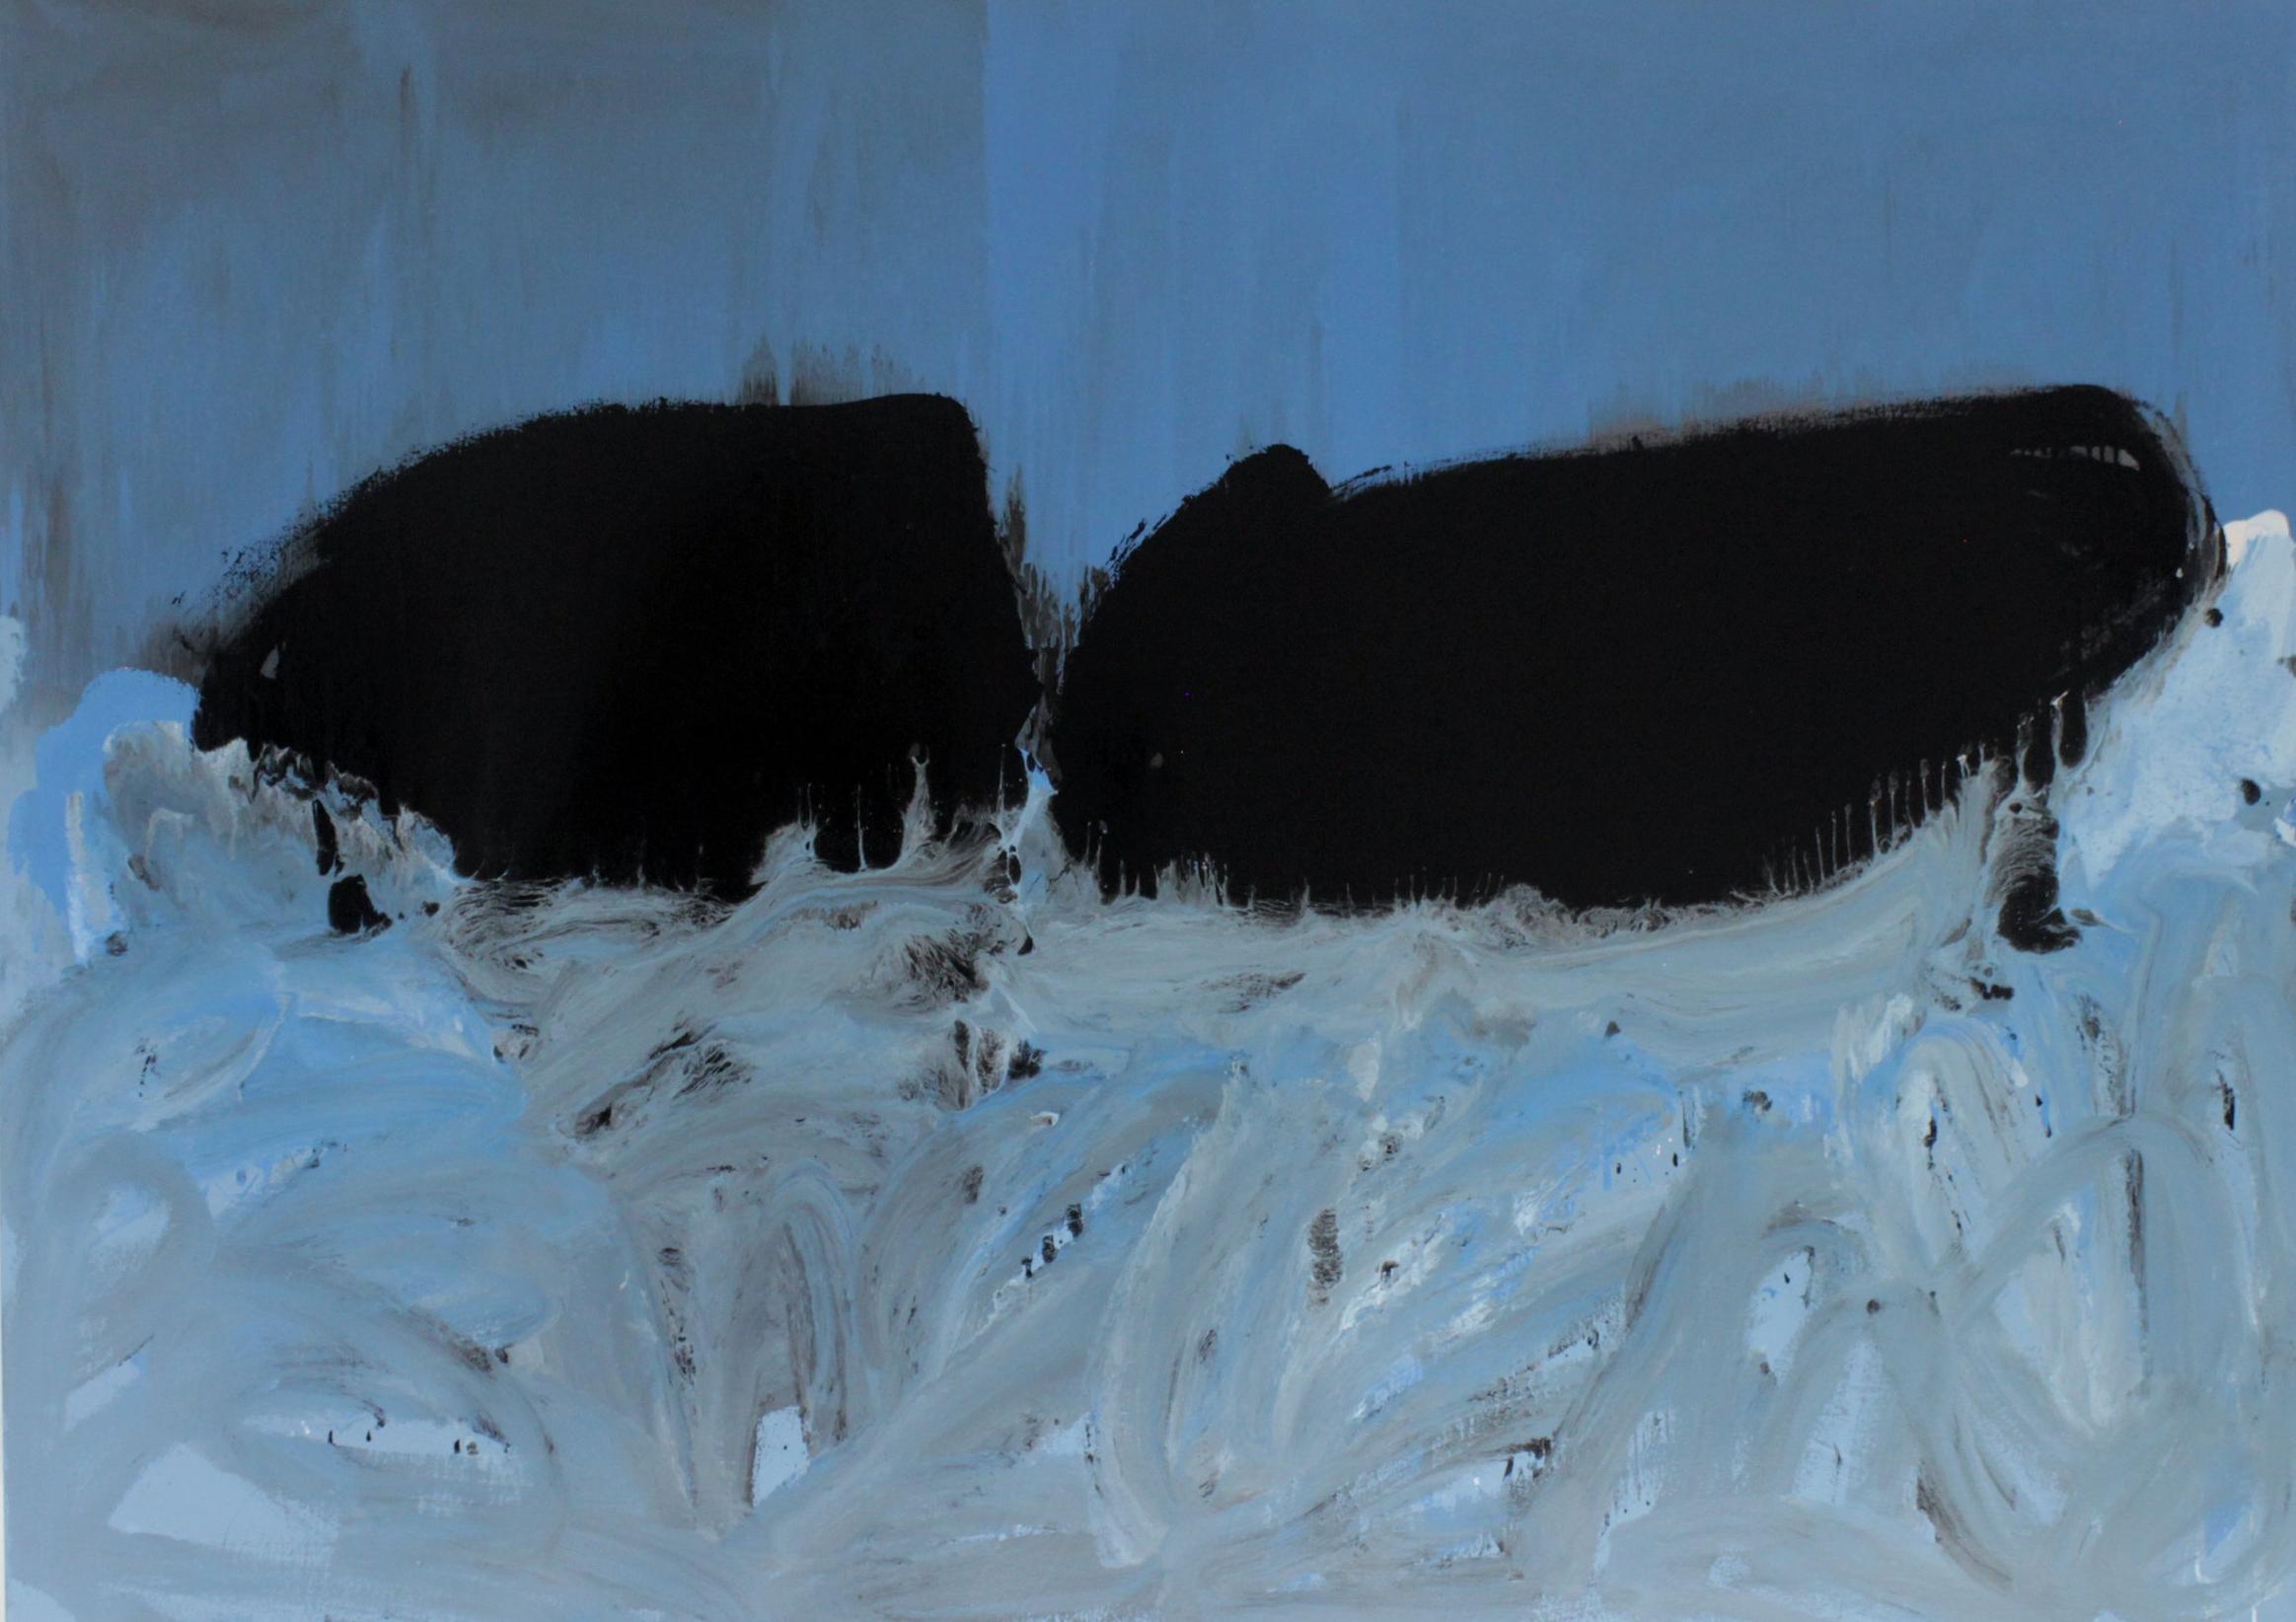 Untitled, 2016, enamel paint on canvas, 168 x 229 cm